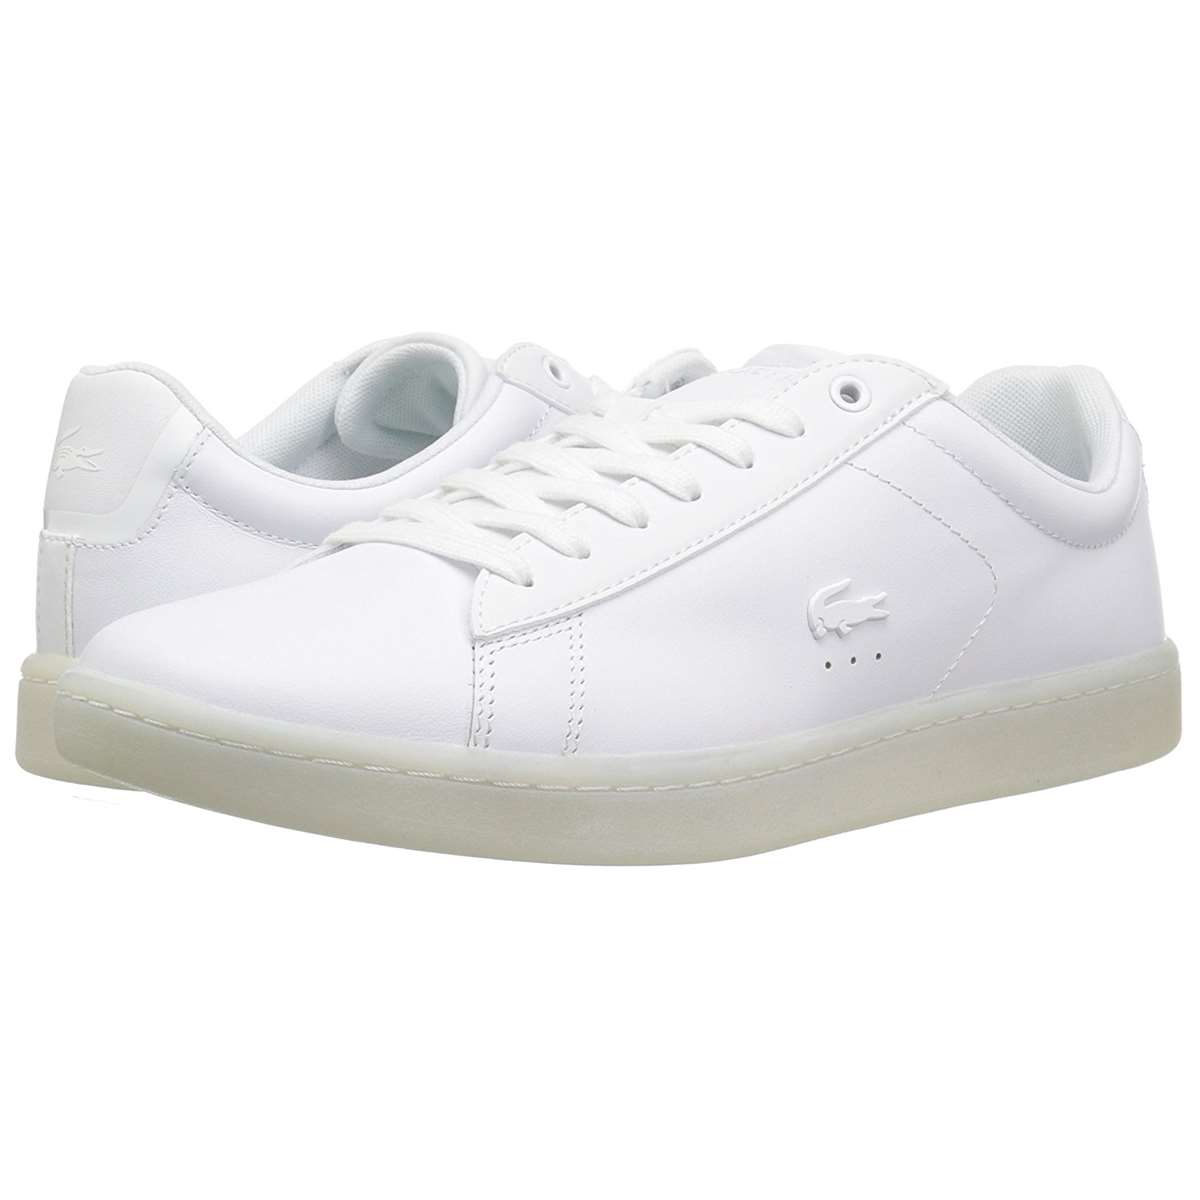 Lacoste Women Carnaby Evo 118 3 Fashion Sneakers